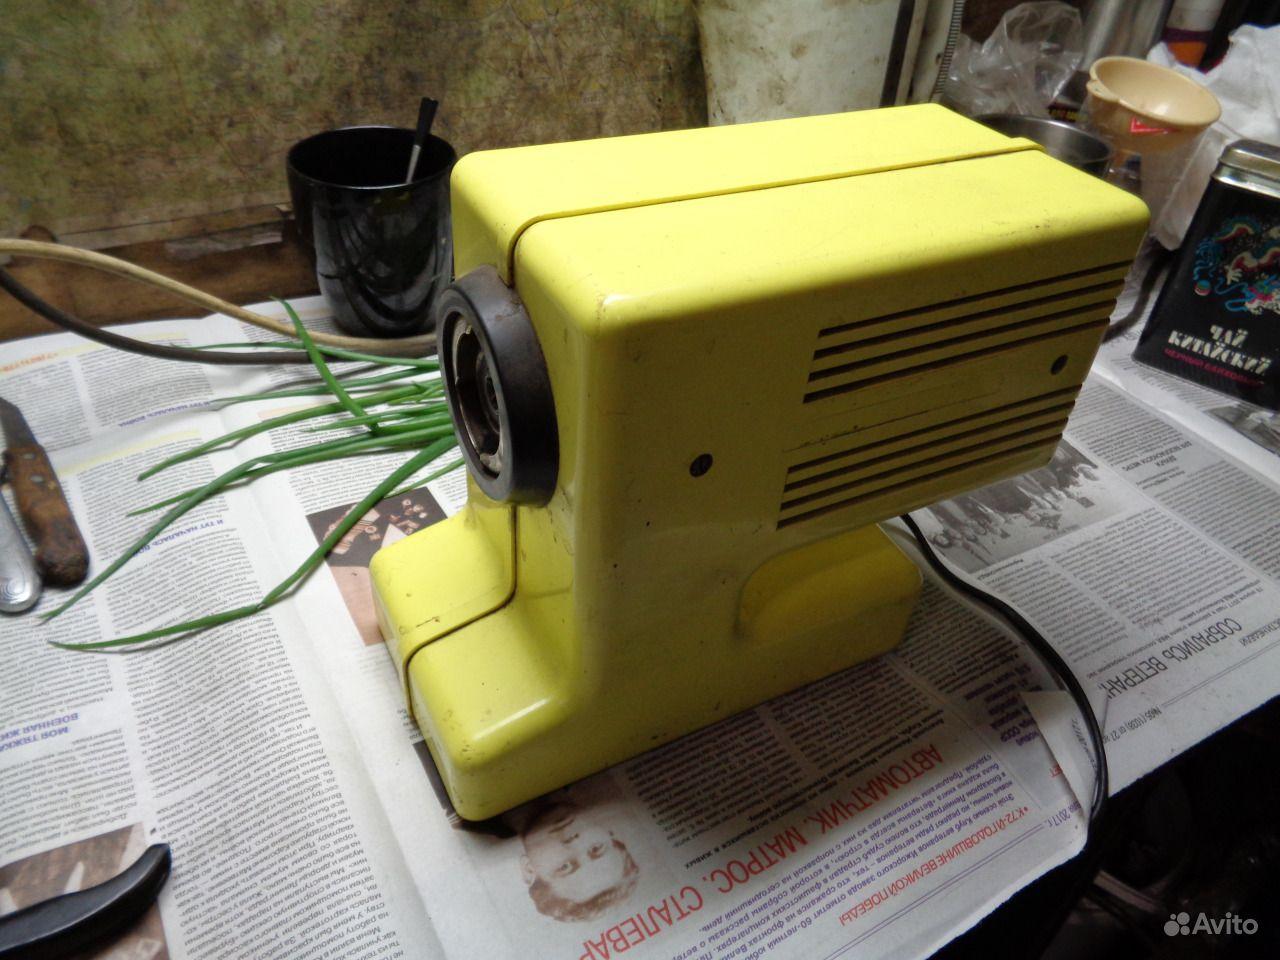 электромясорубка эмш-33100-4 ухл4 инструкция